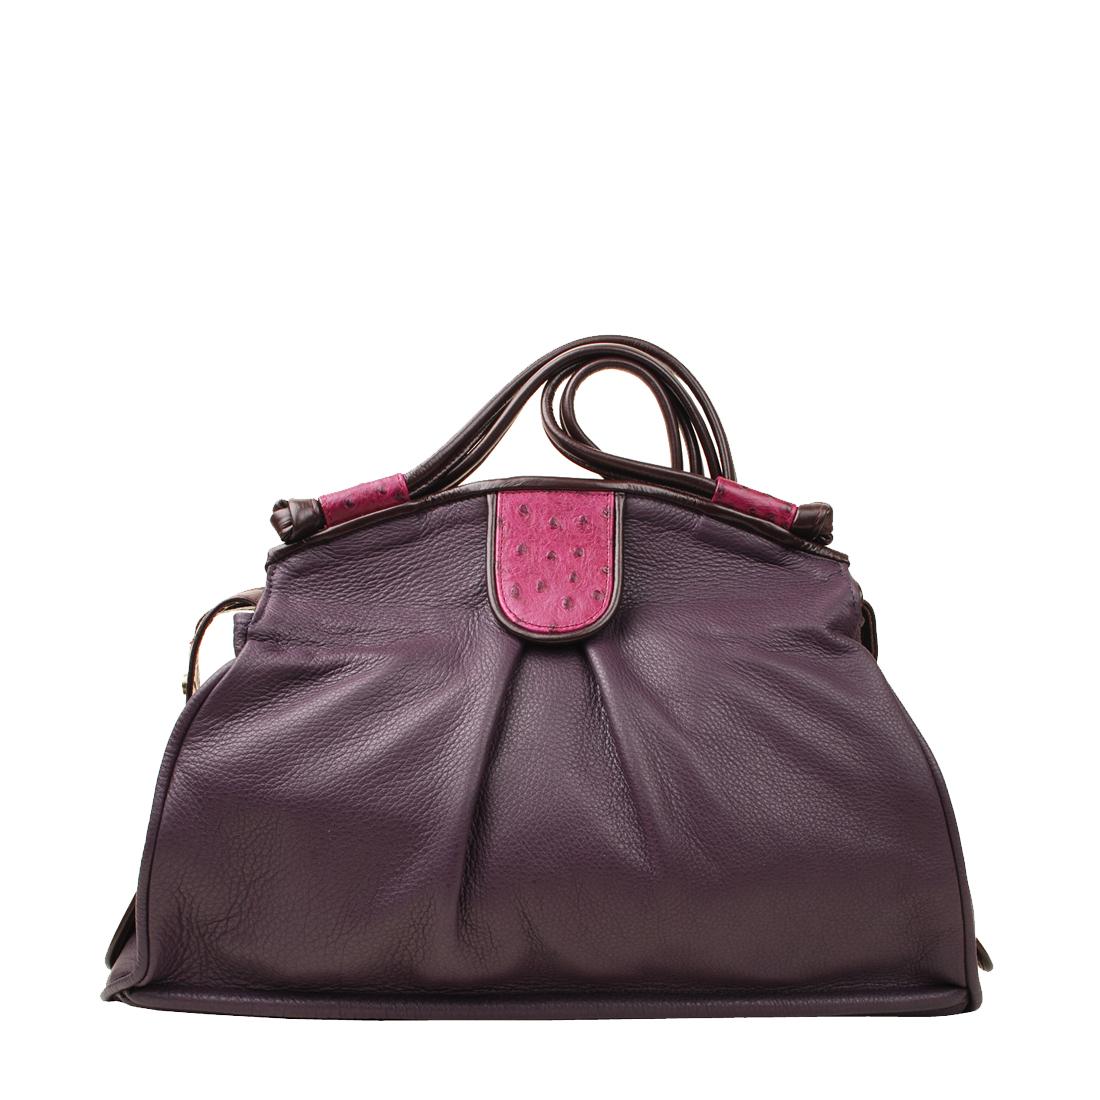 Jessica Magenata Leather Shoulder Bag